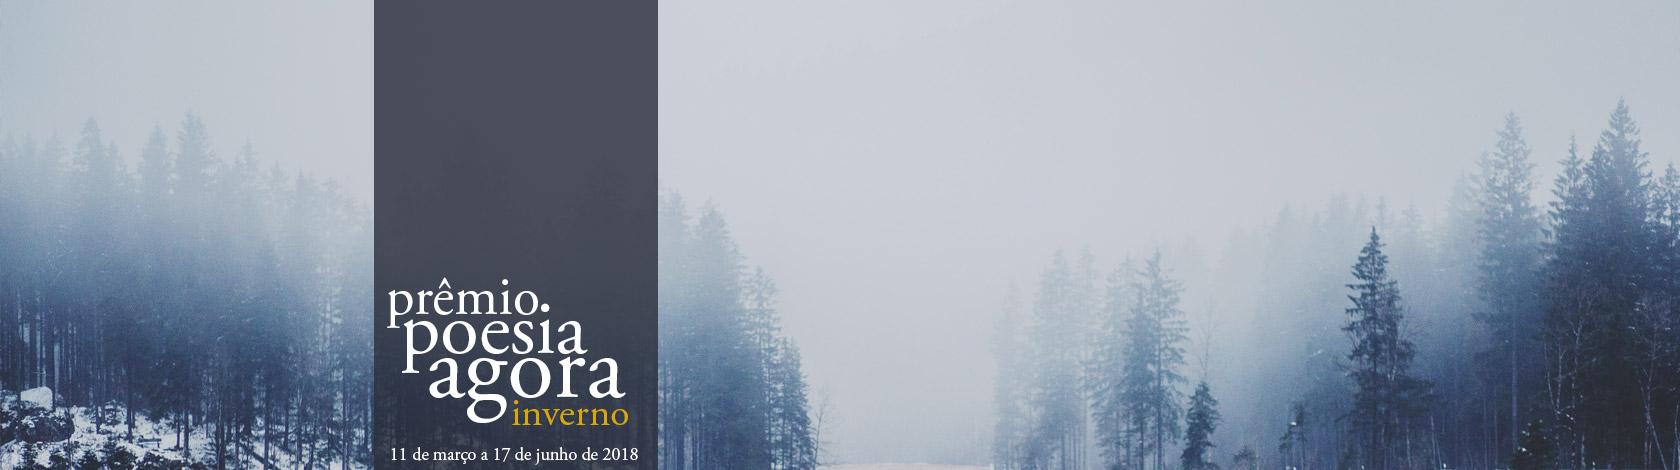 Concurso Literário Prêmio Poesia Agora - Inverno (Foto: Dominik Dombrowski)